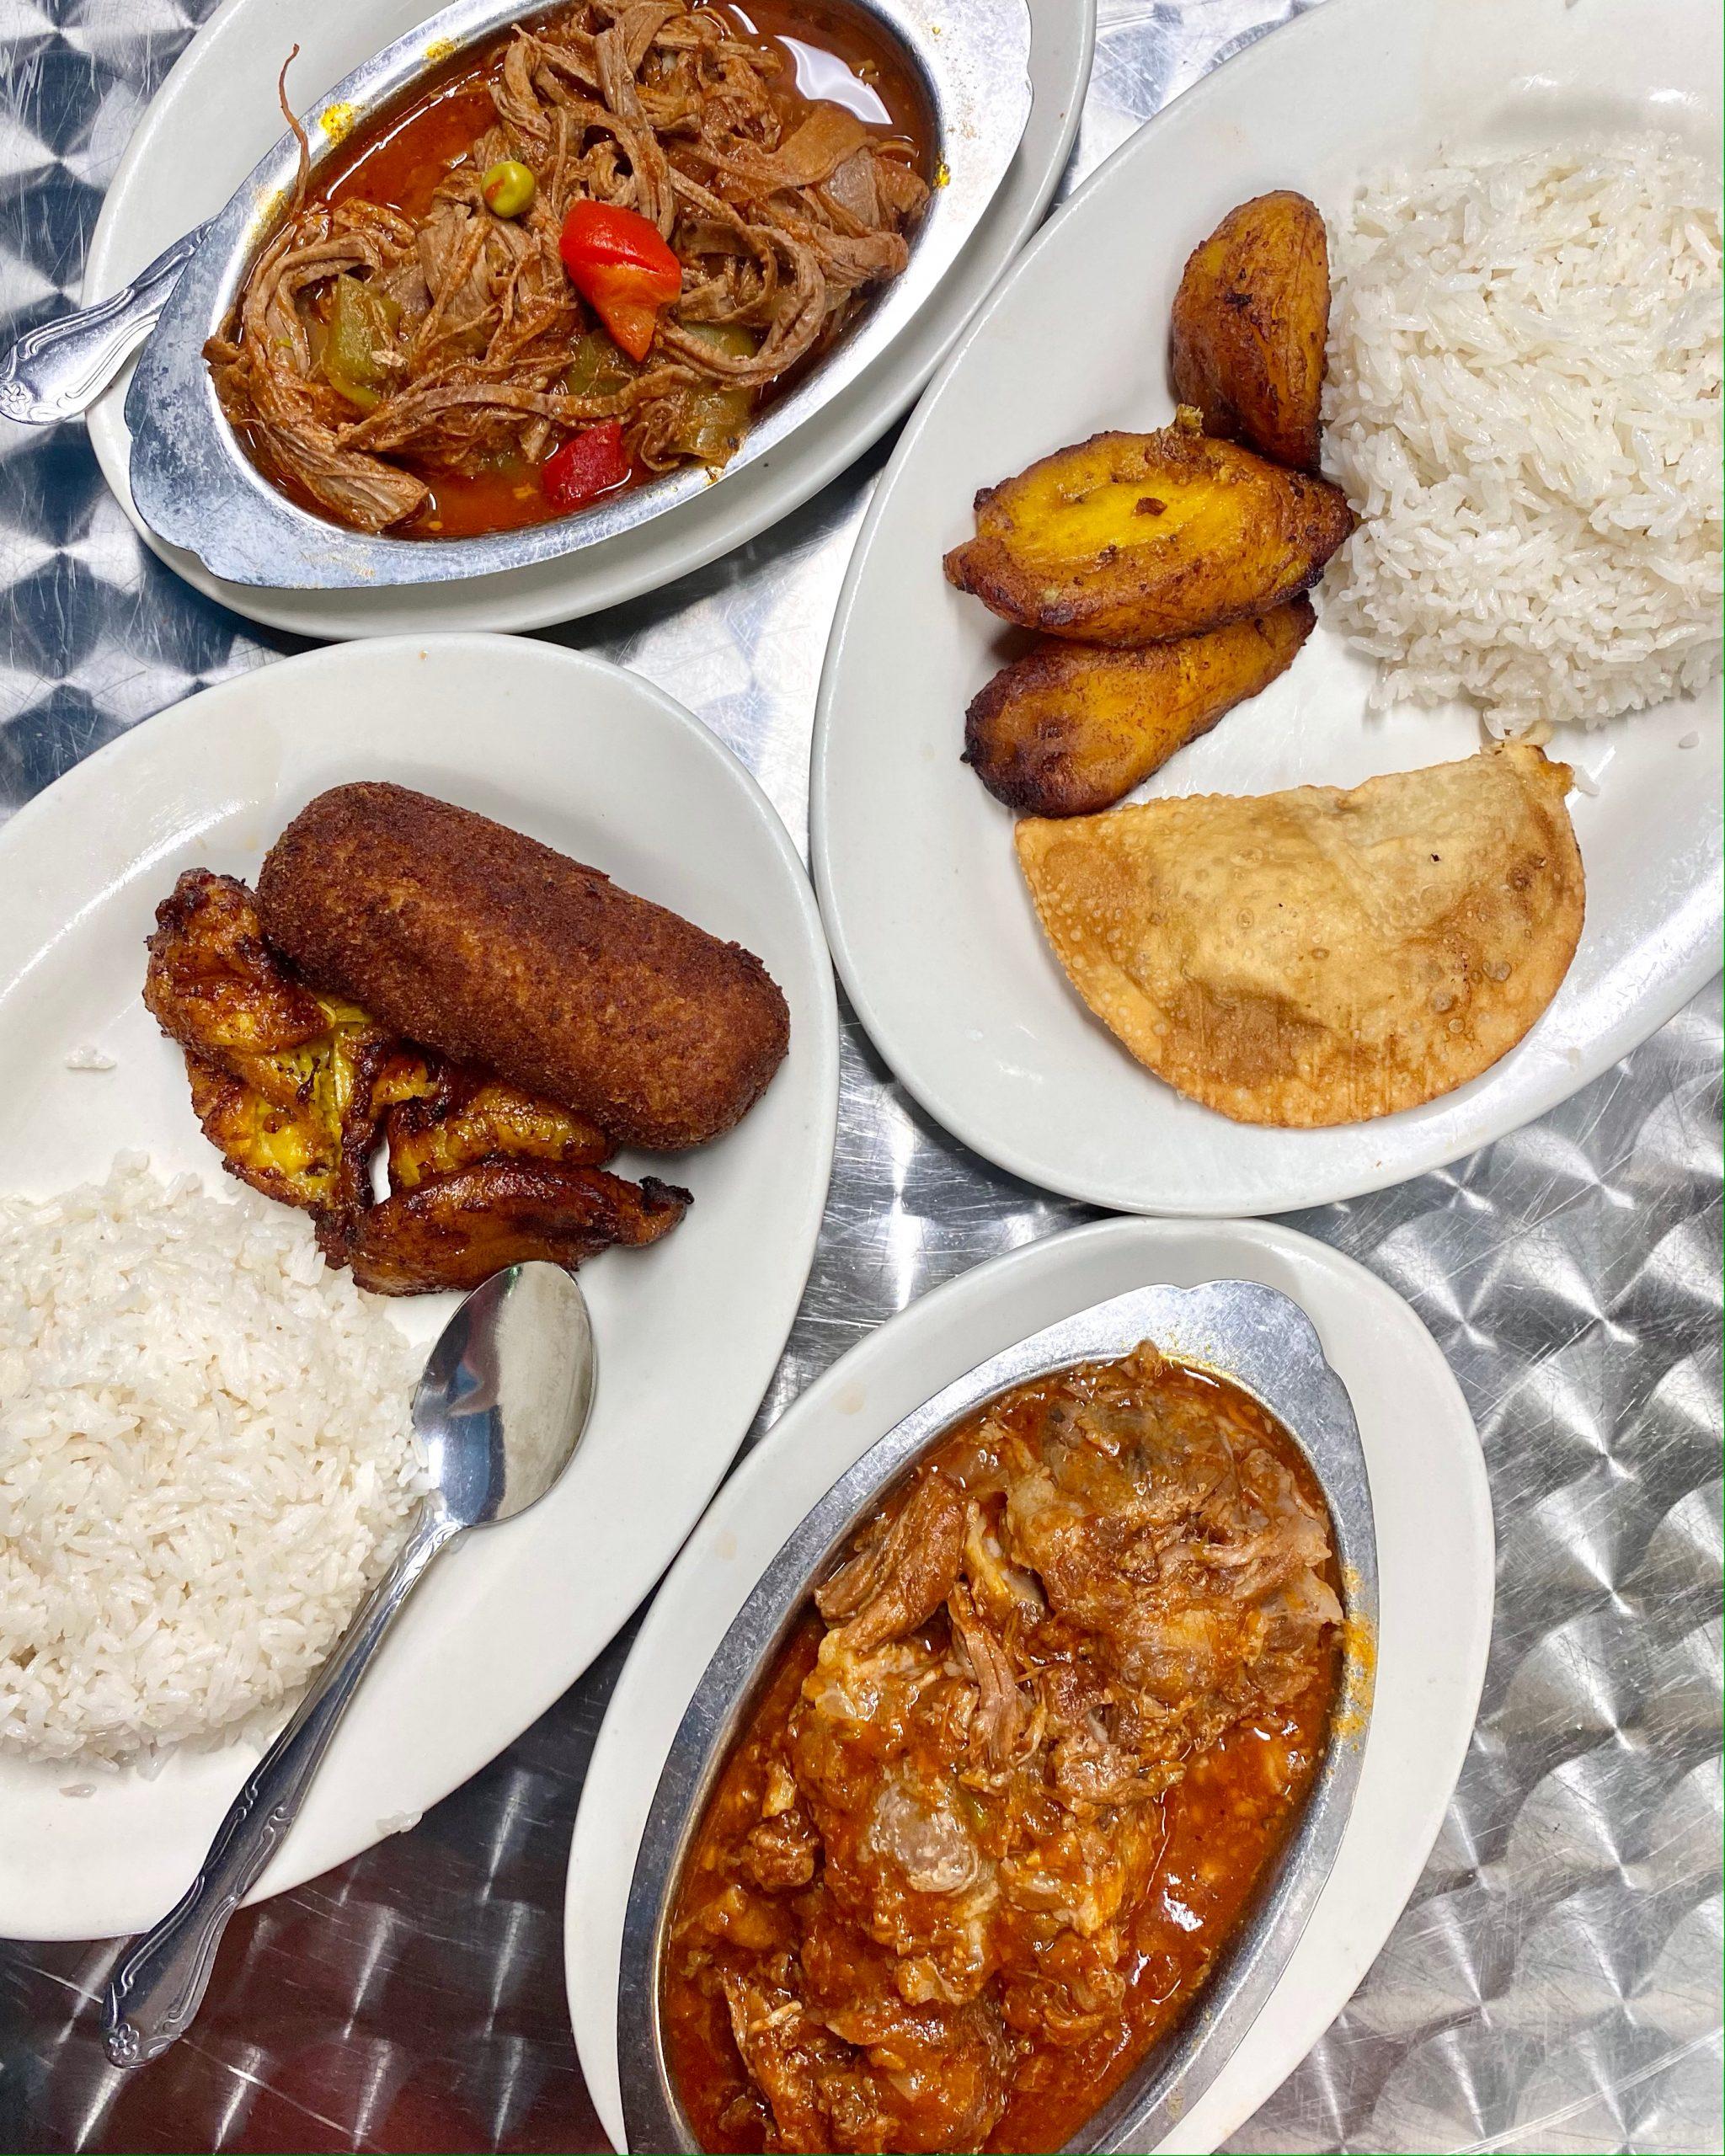 Cuban food at Puerto Sagua in Miami Beach